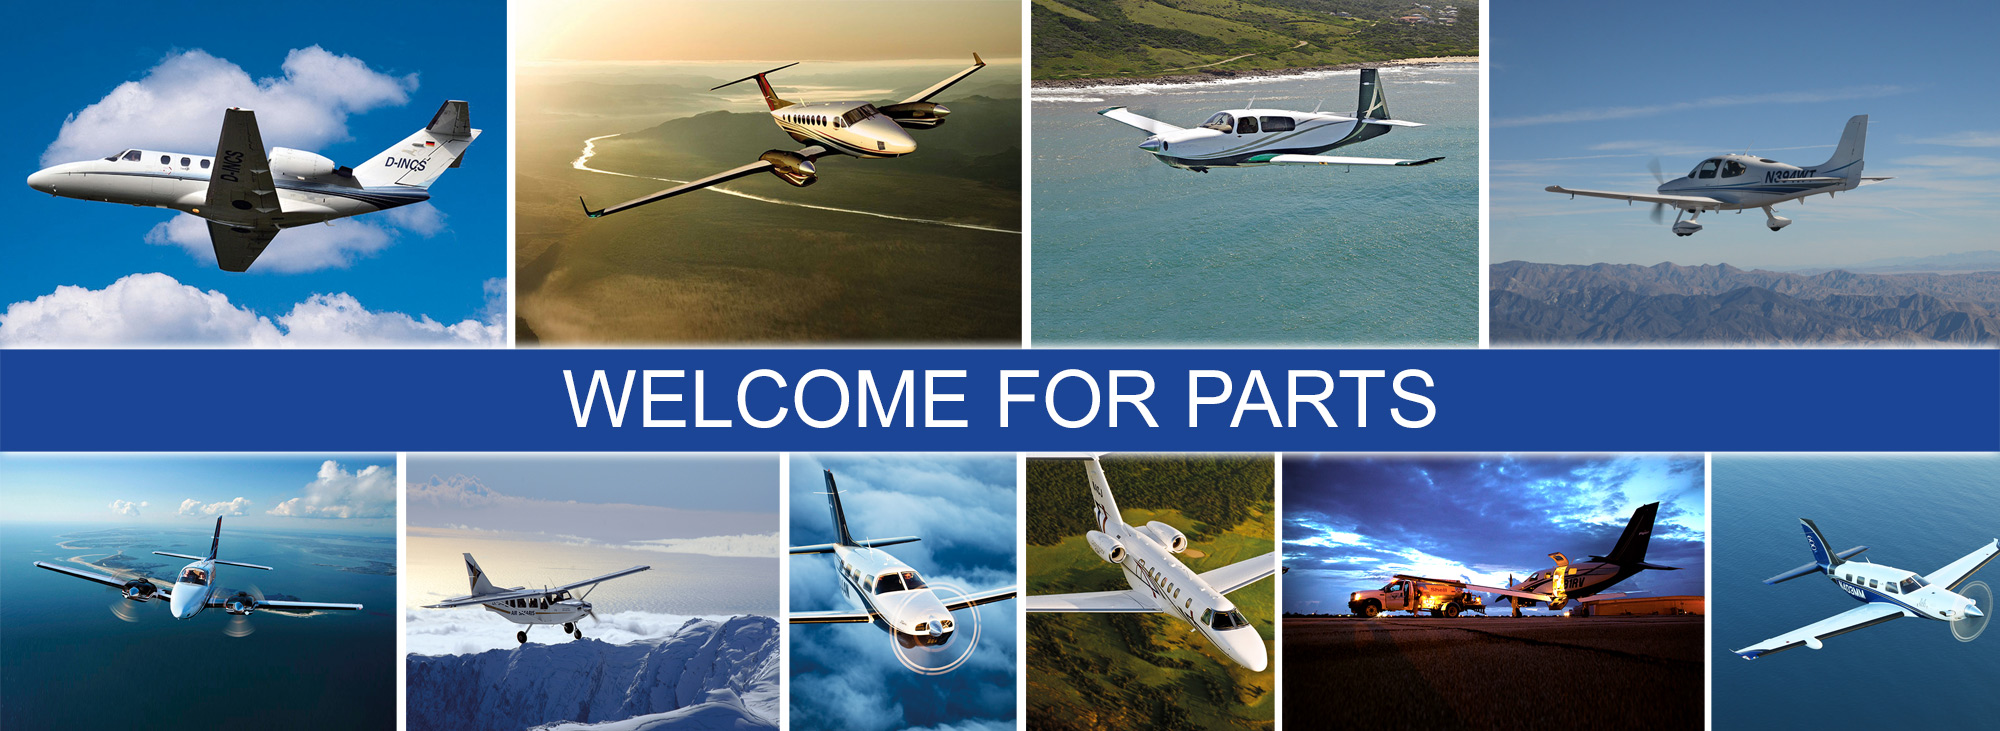 Benvenuti alla GlobalAviation24.com!